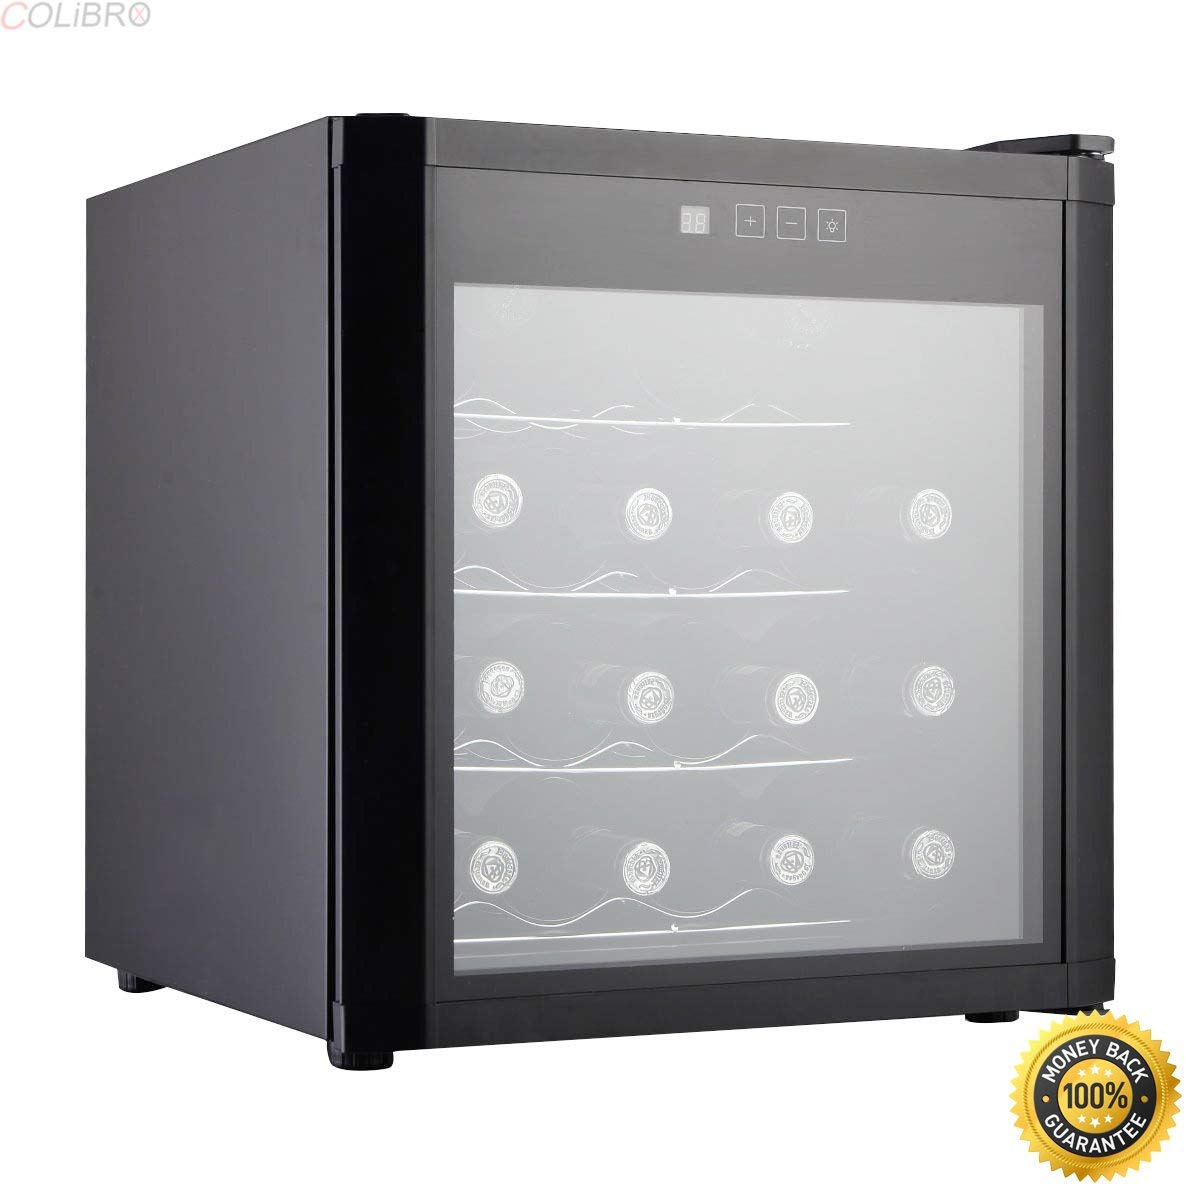 COLIBROX--New 16 Bottles Wine Cooler Fridge Cellar Storage Holder Chiller Bar Rack Cabinet,best buy wine coolers,best wine refrigerators,Energy-Efficient 16 Bottles Semi-Conductor Wine Cooler